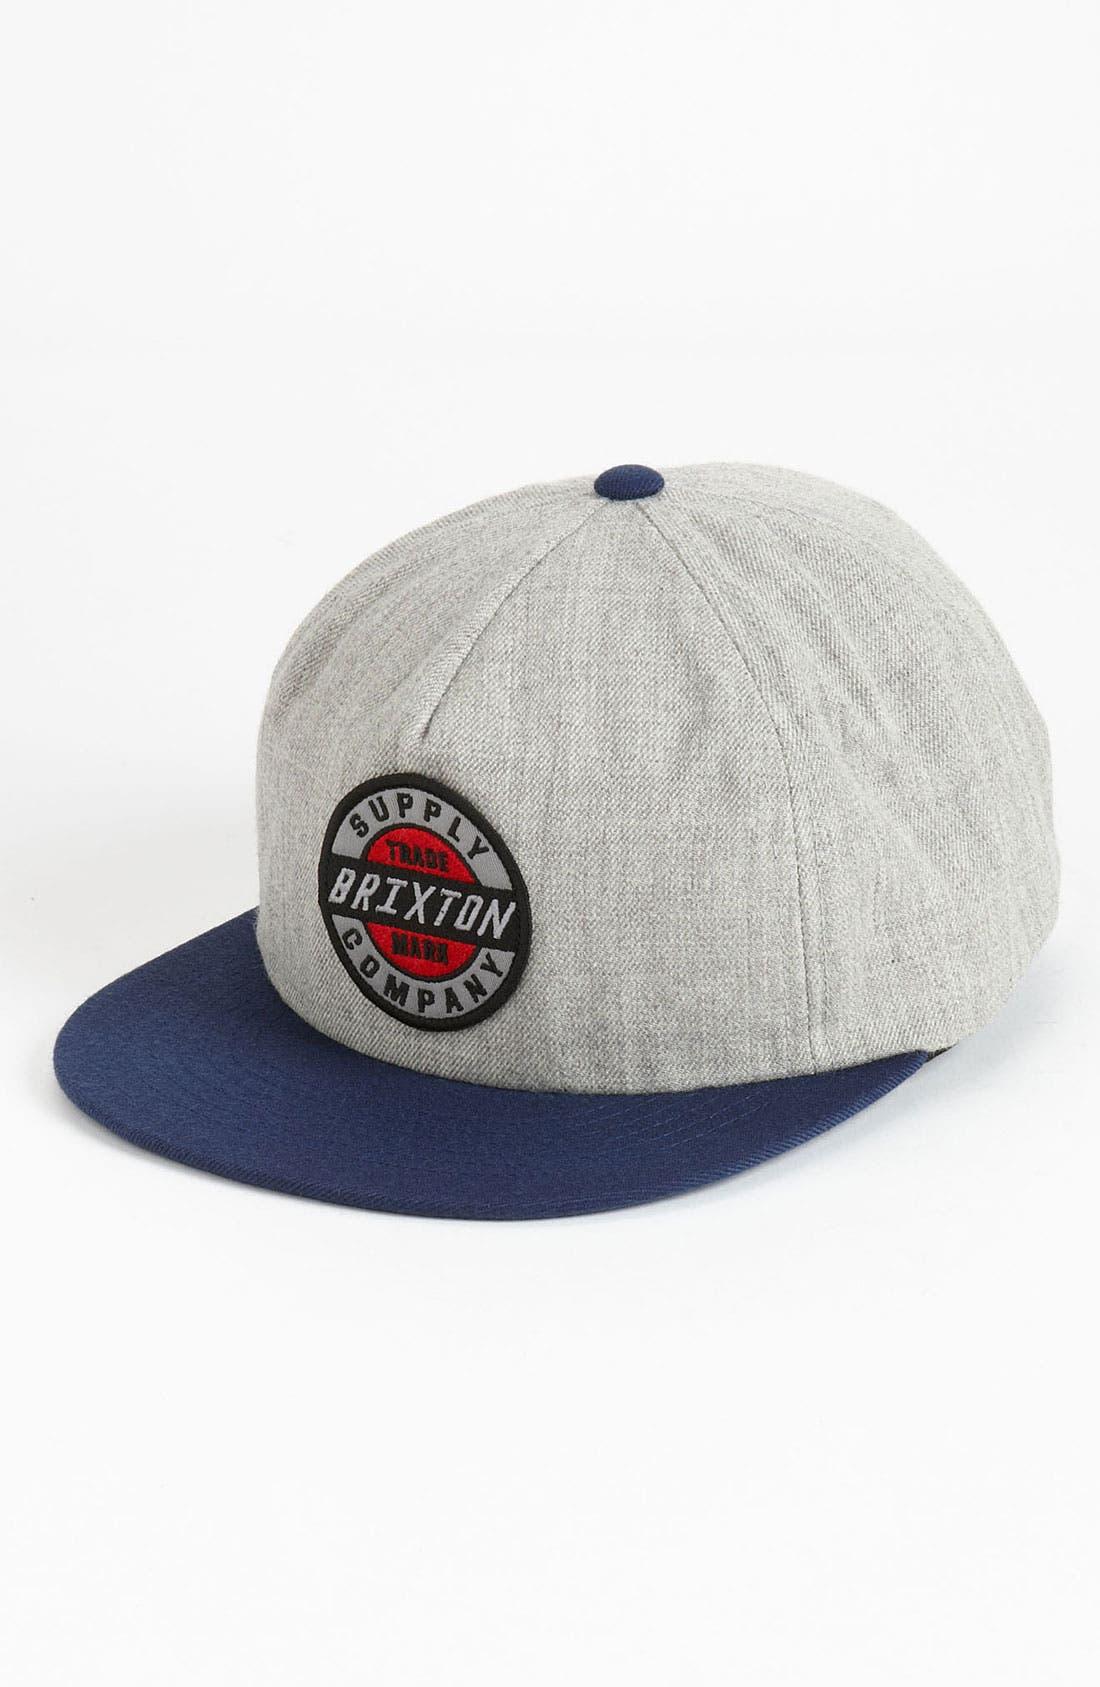 Alternate Image 1 Selected - Brixton 'Council' Snapback Baseball Cap